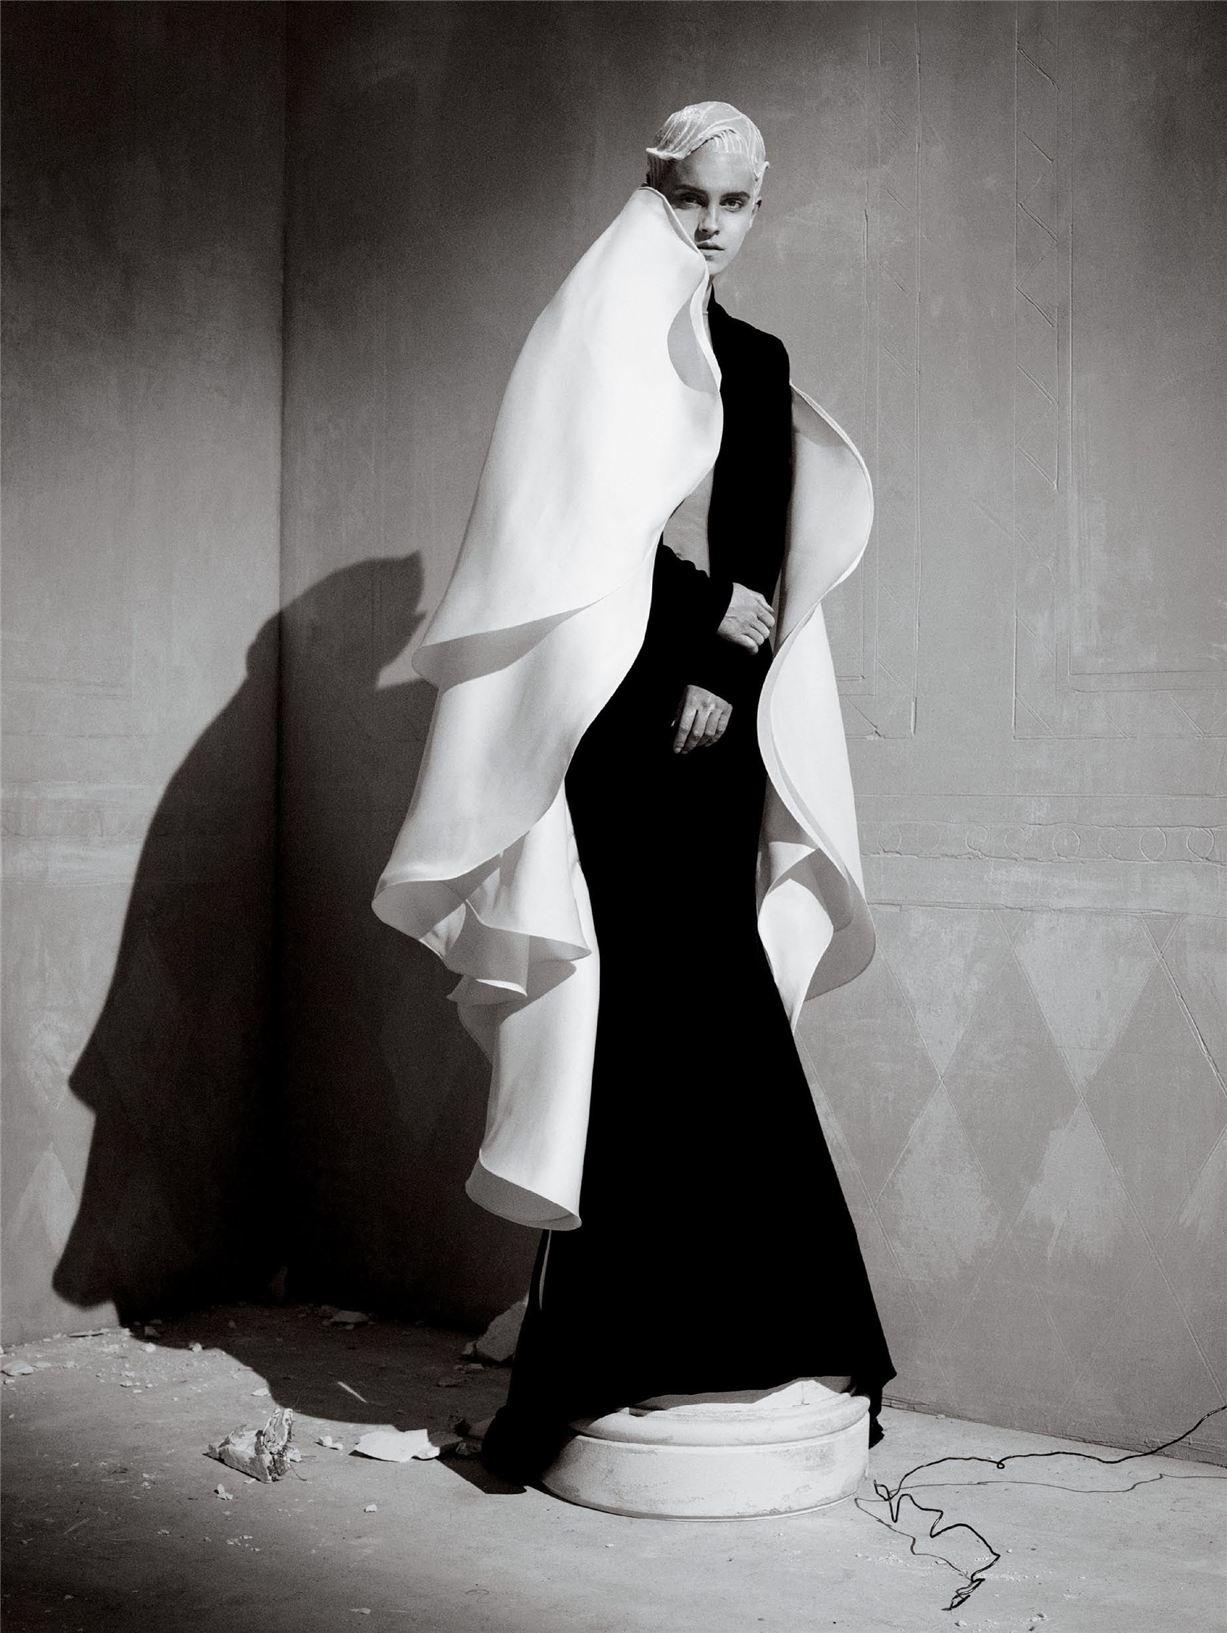 Бунтующая красавица Эмма Уотсон / Emma Watson by Tim Walker - Vanity Fair march 2017